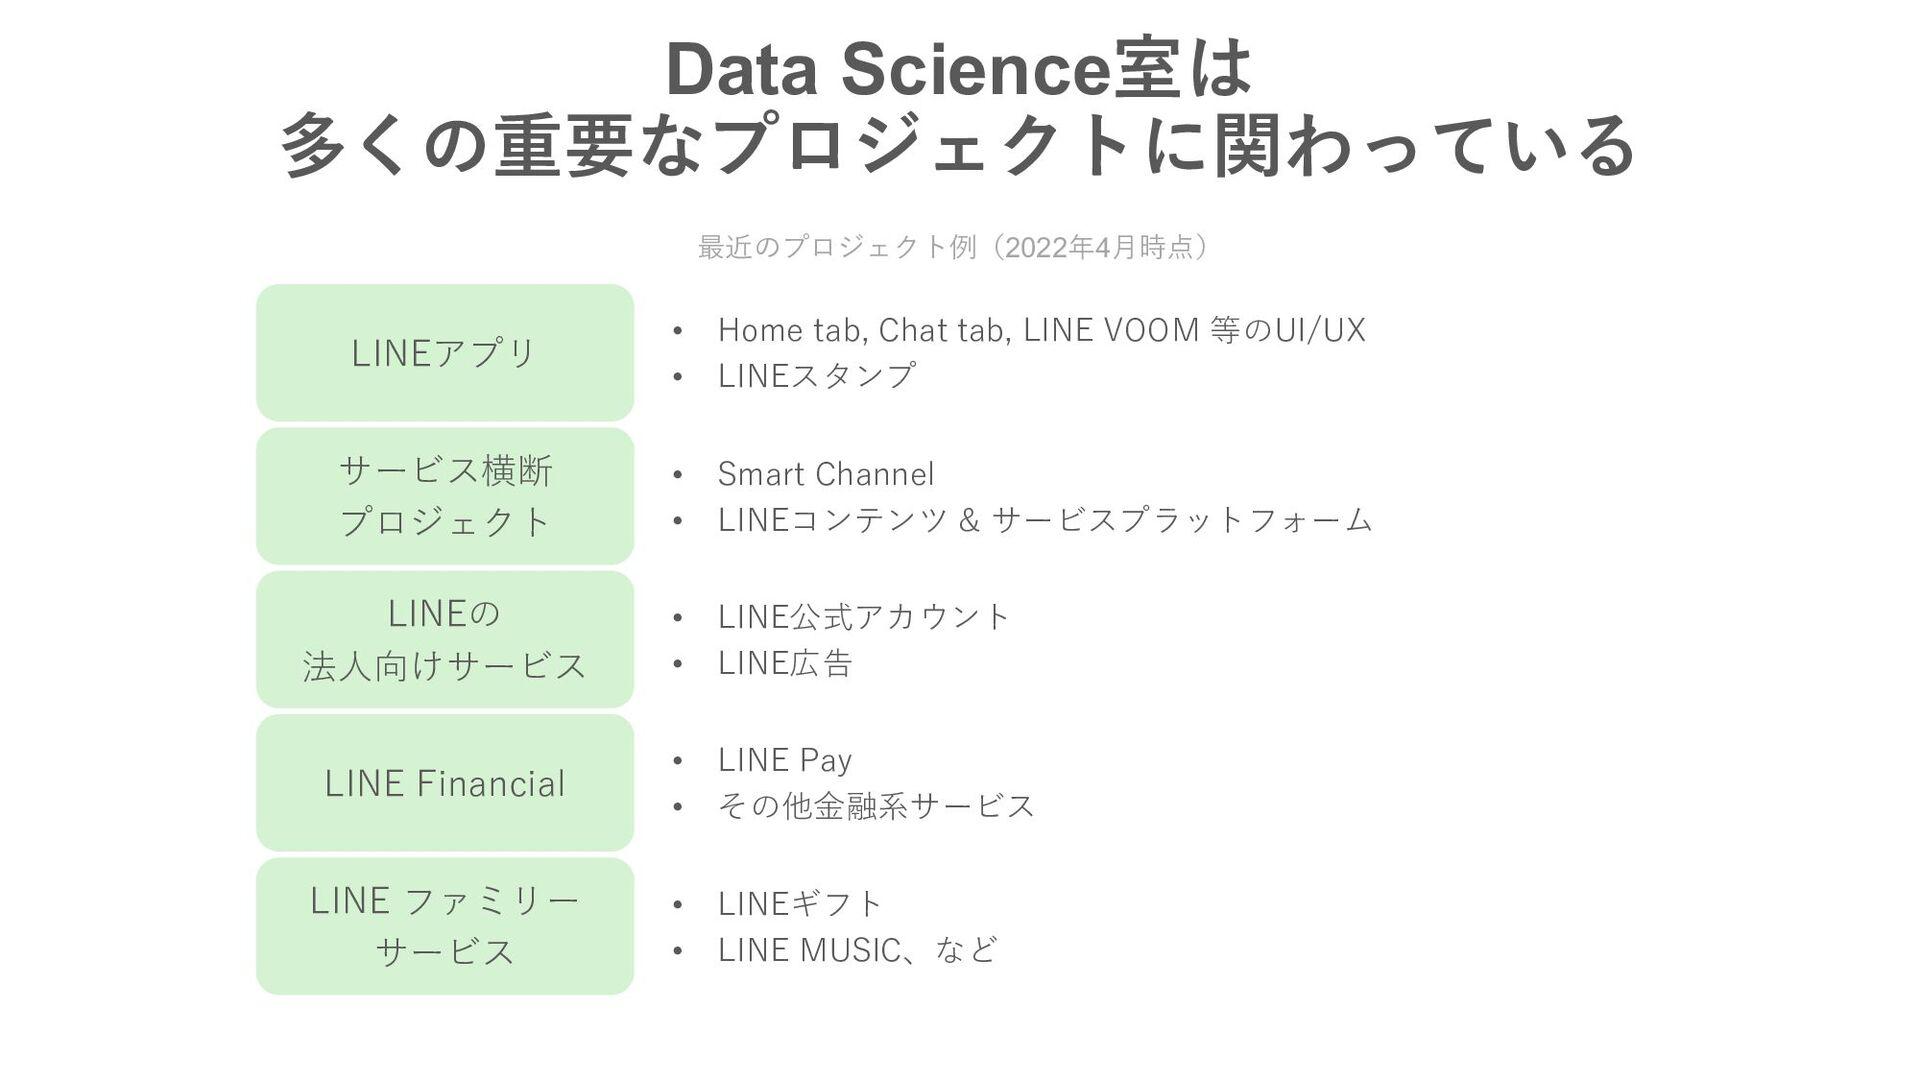 DATA SCIENCE室の業務の概要